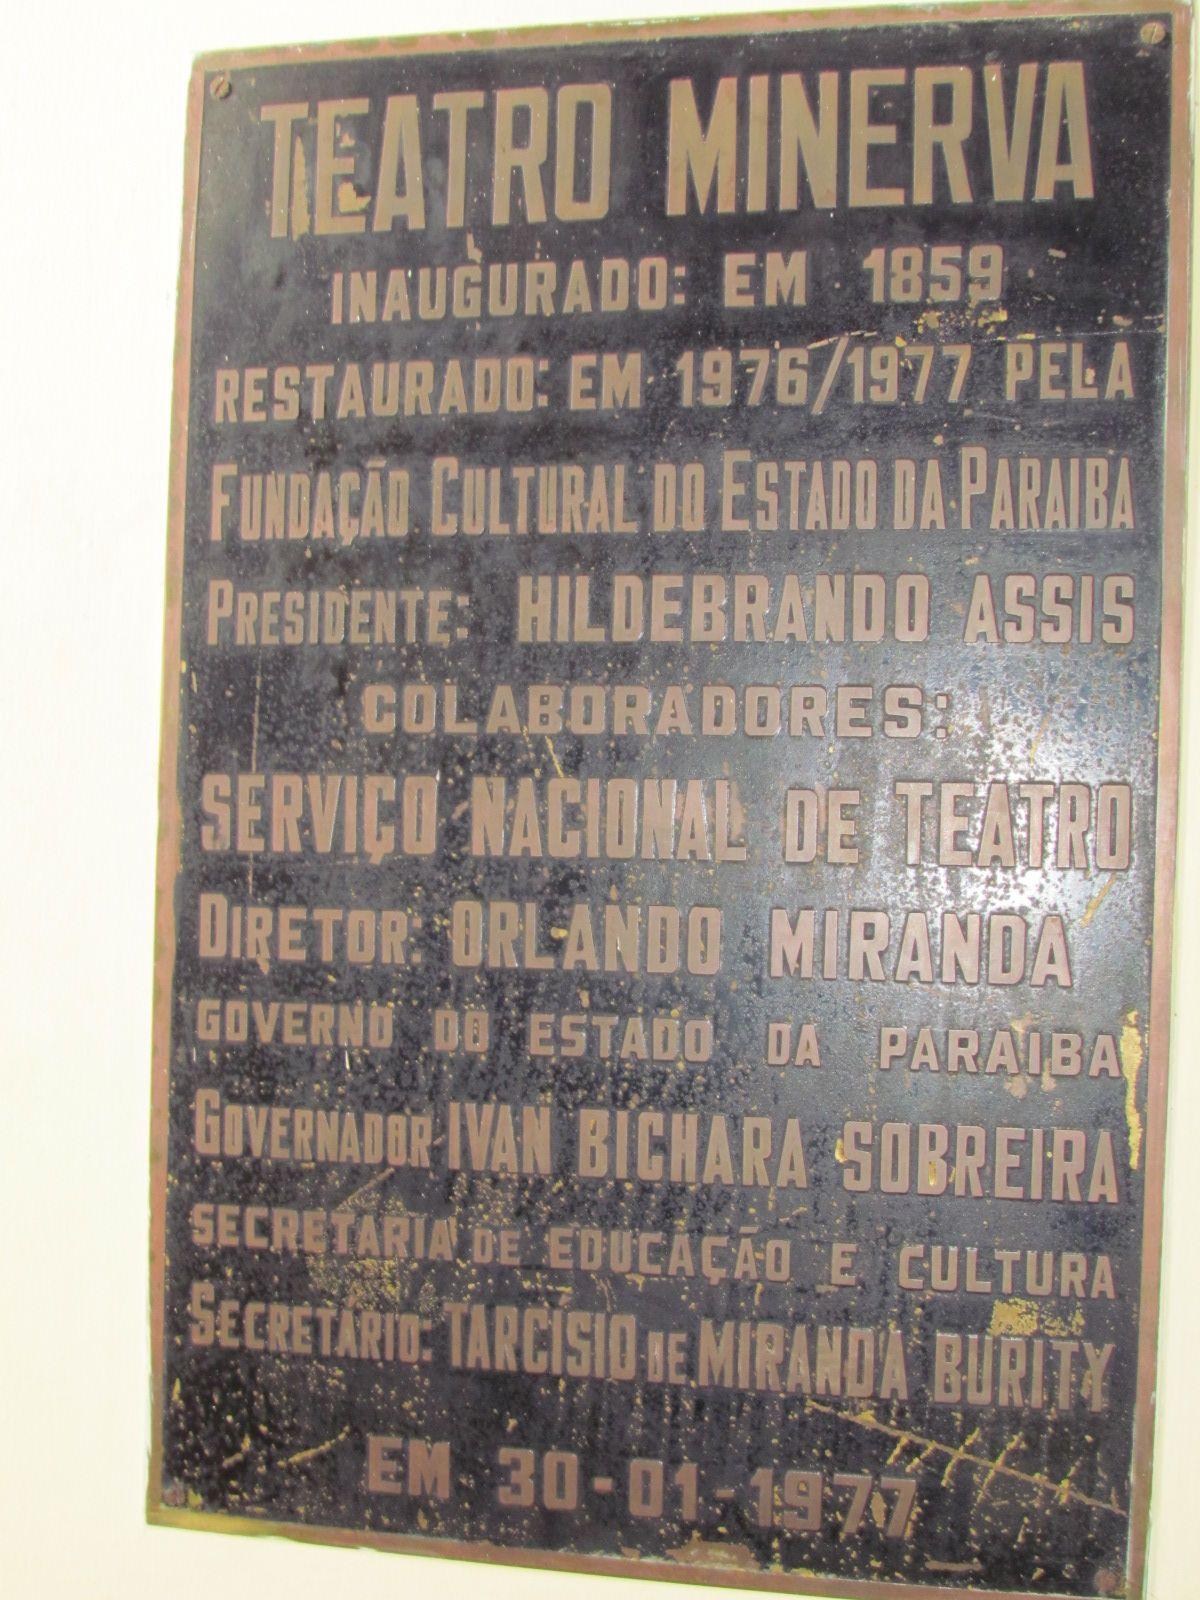 Primeiro teatro da Paraíba, construído na cidade de Areia. Tem a característica de ser um teatro particular, feito por um rico comerciante local.